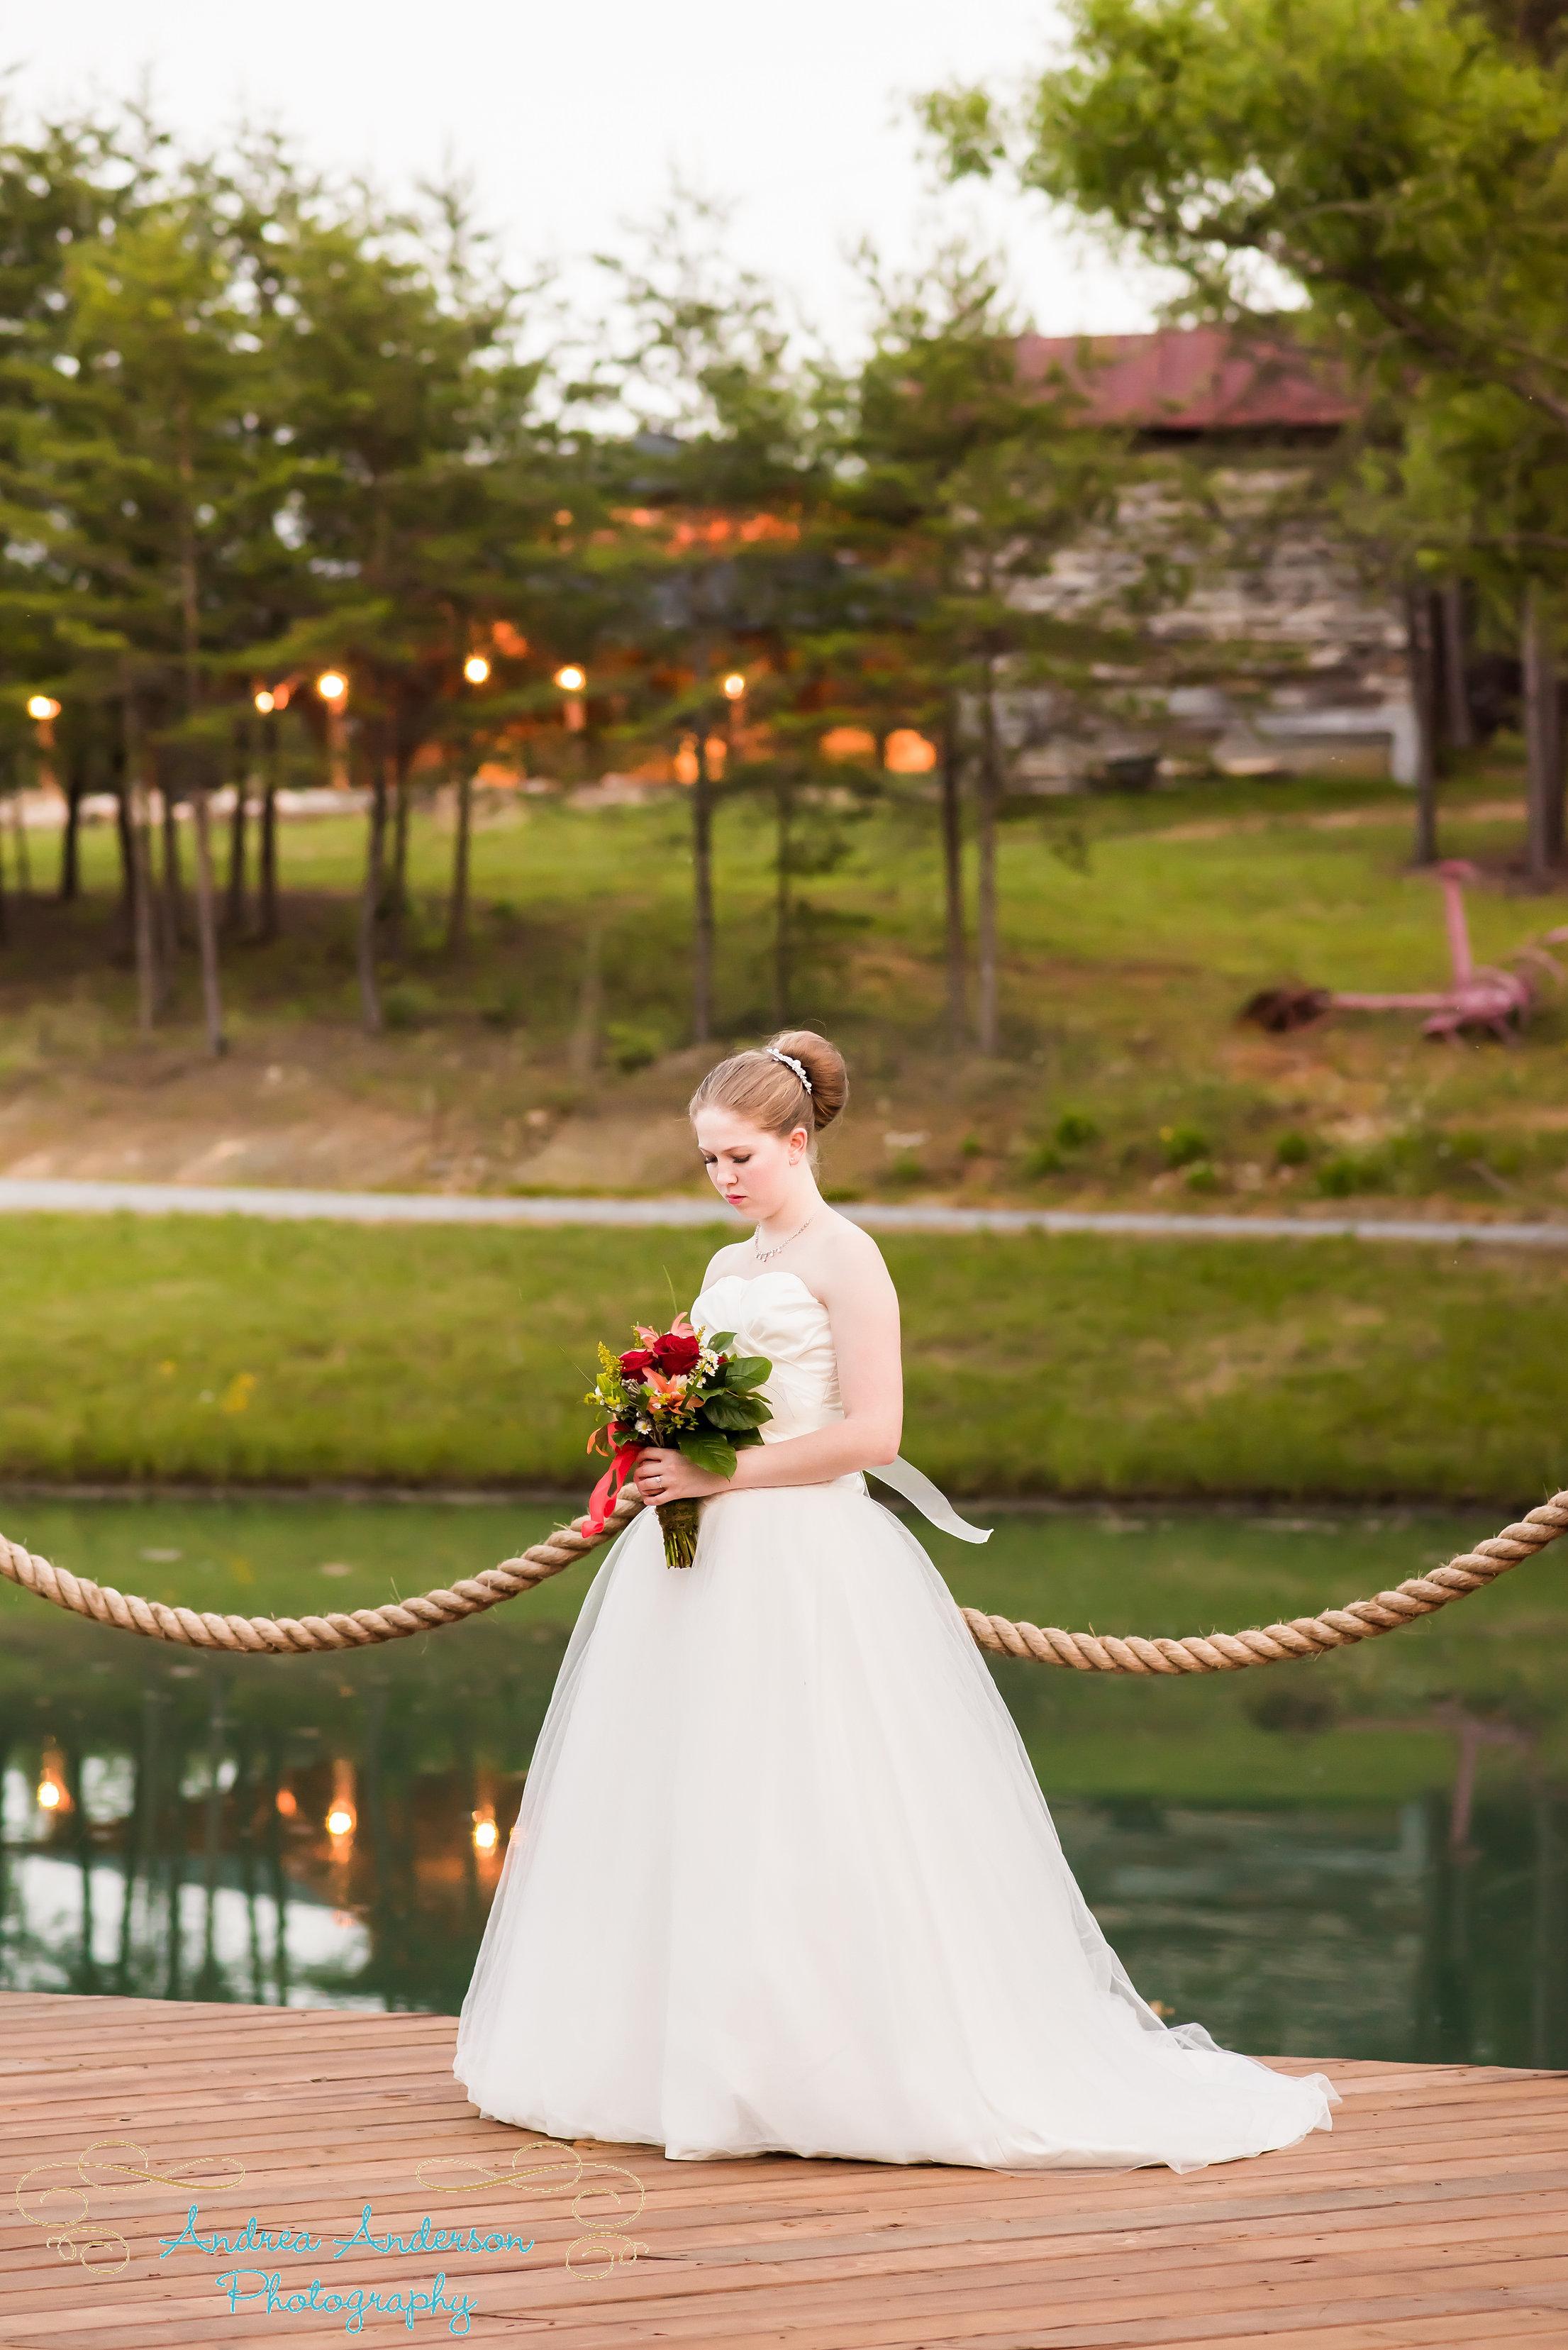 Search Eastern Nc Wedding Venues Free Image